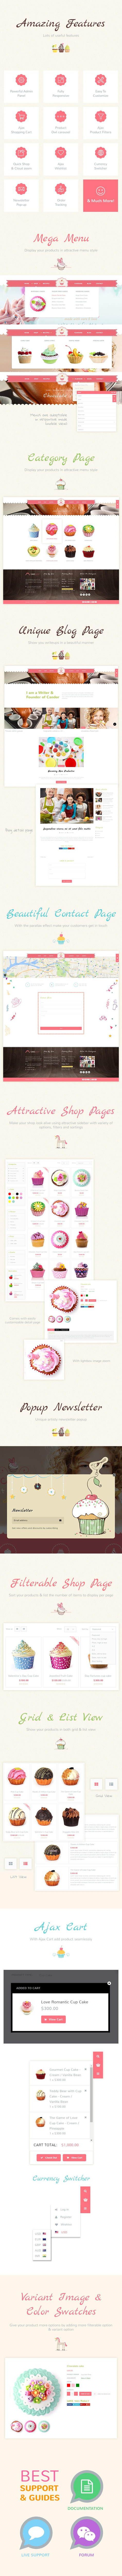 Cake Shop - Cafe Shopify Theme - 1